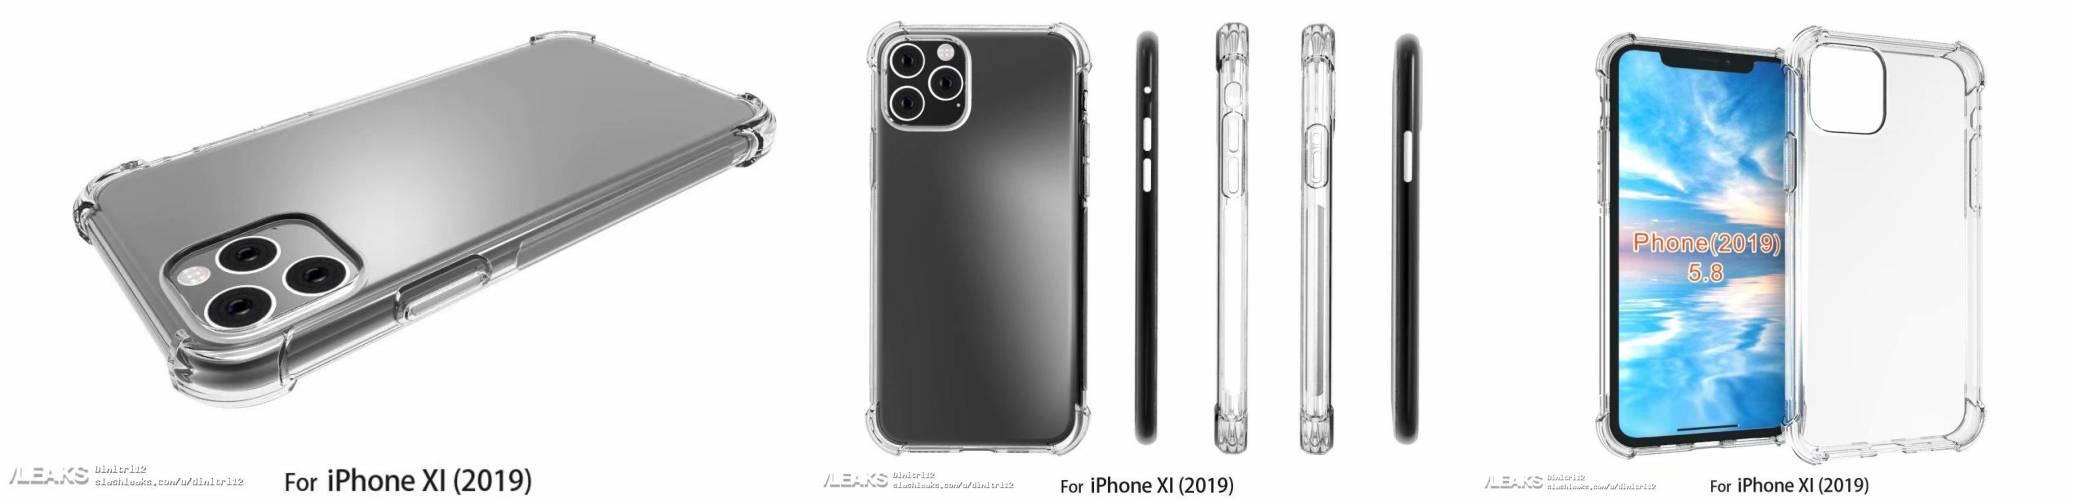 iPhone 11 carcasa 11 max 1